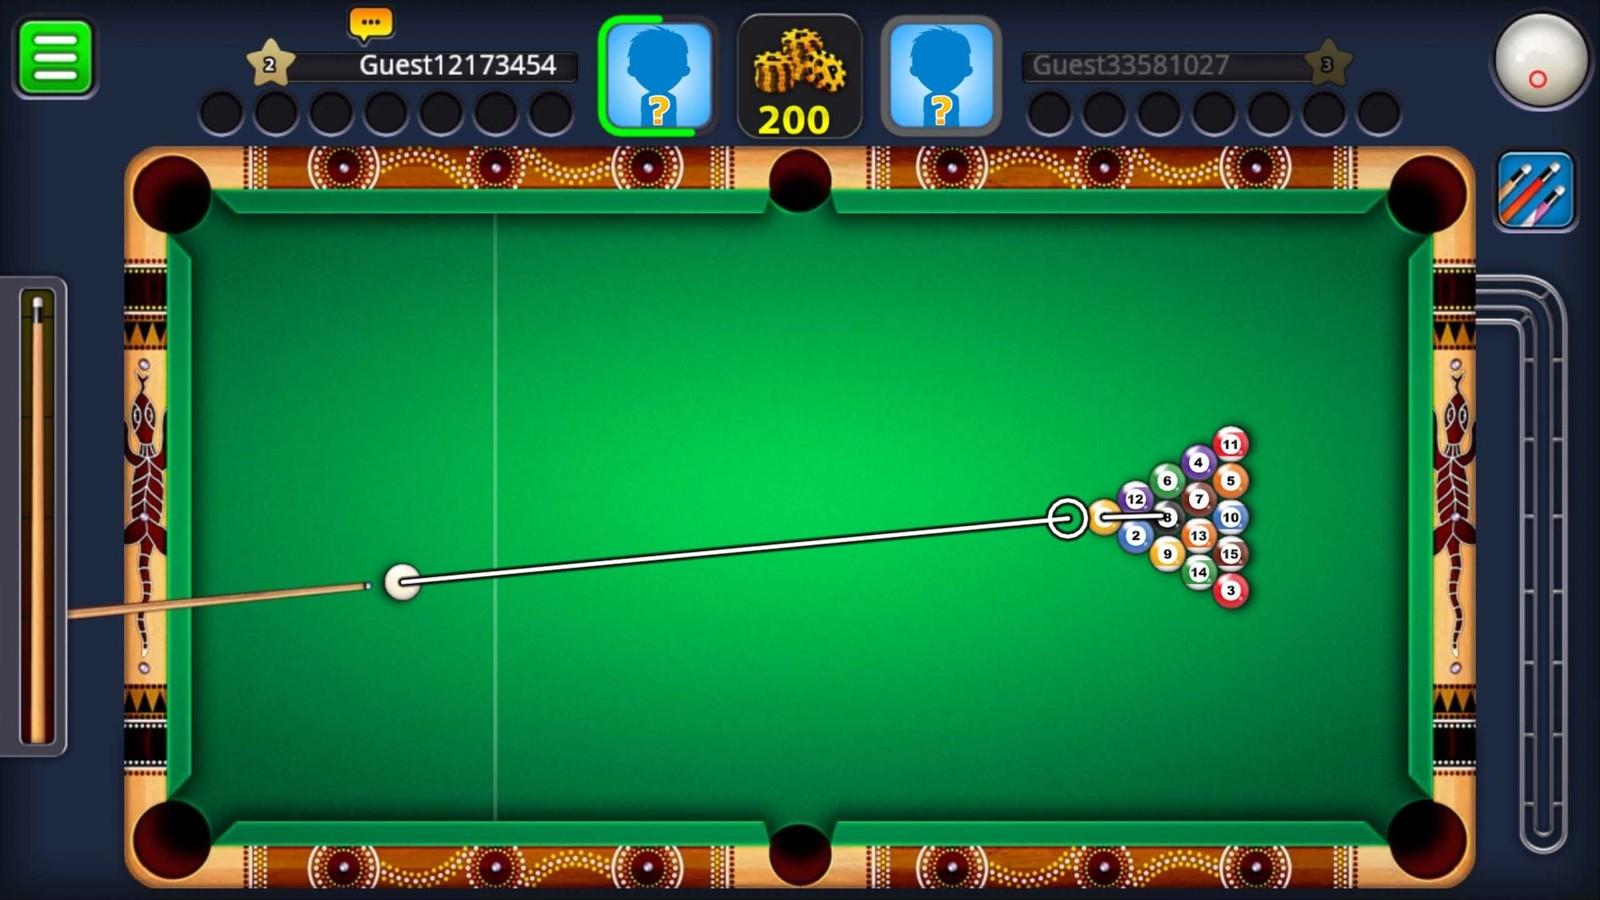 8ball.vip 8 ball pool hack cash generator | Flob.fun/8ball 8 ... -